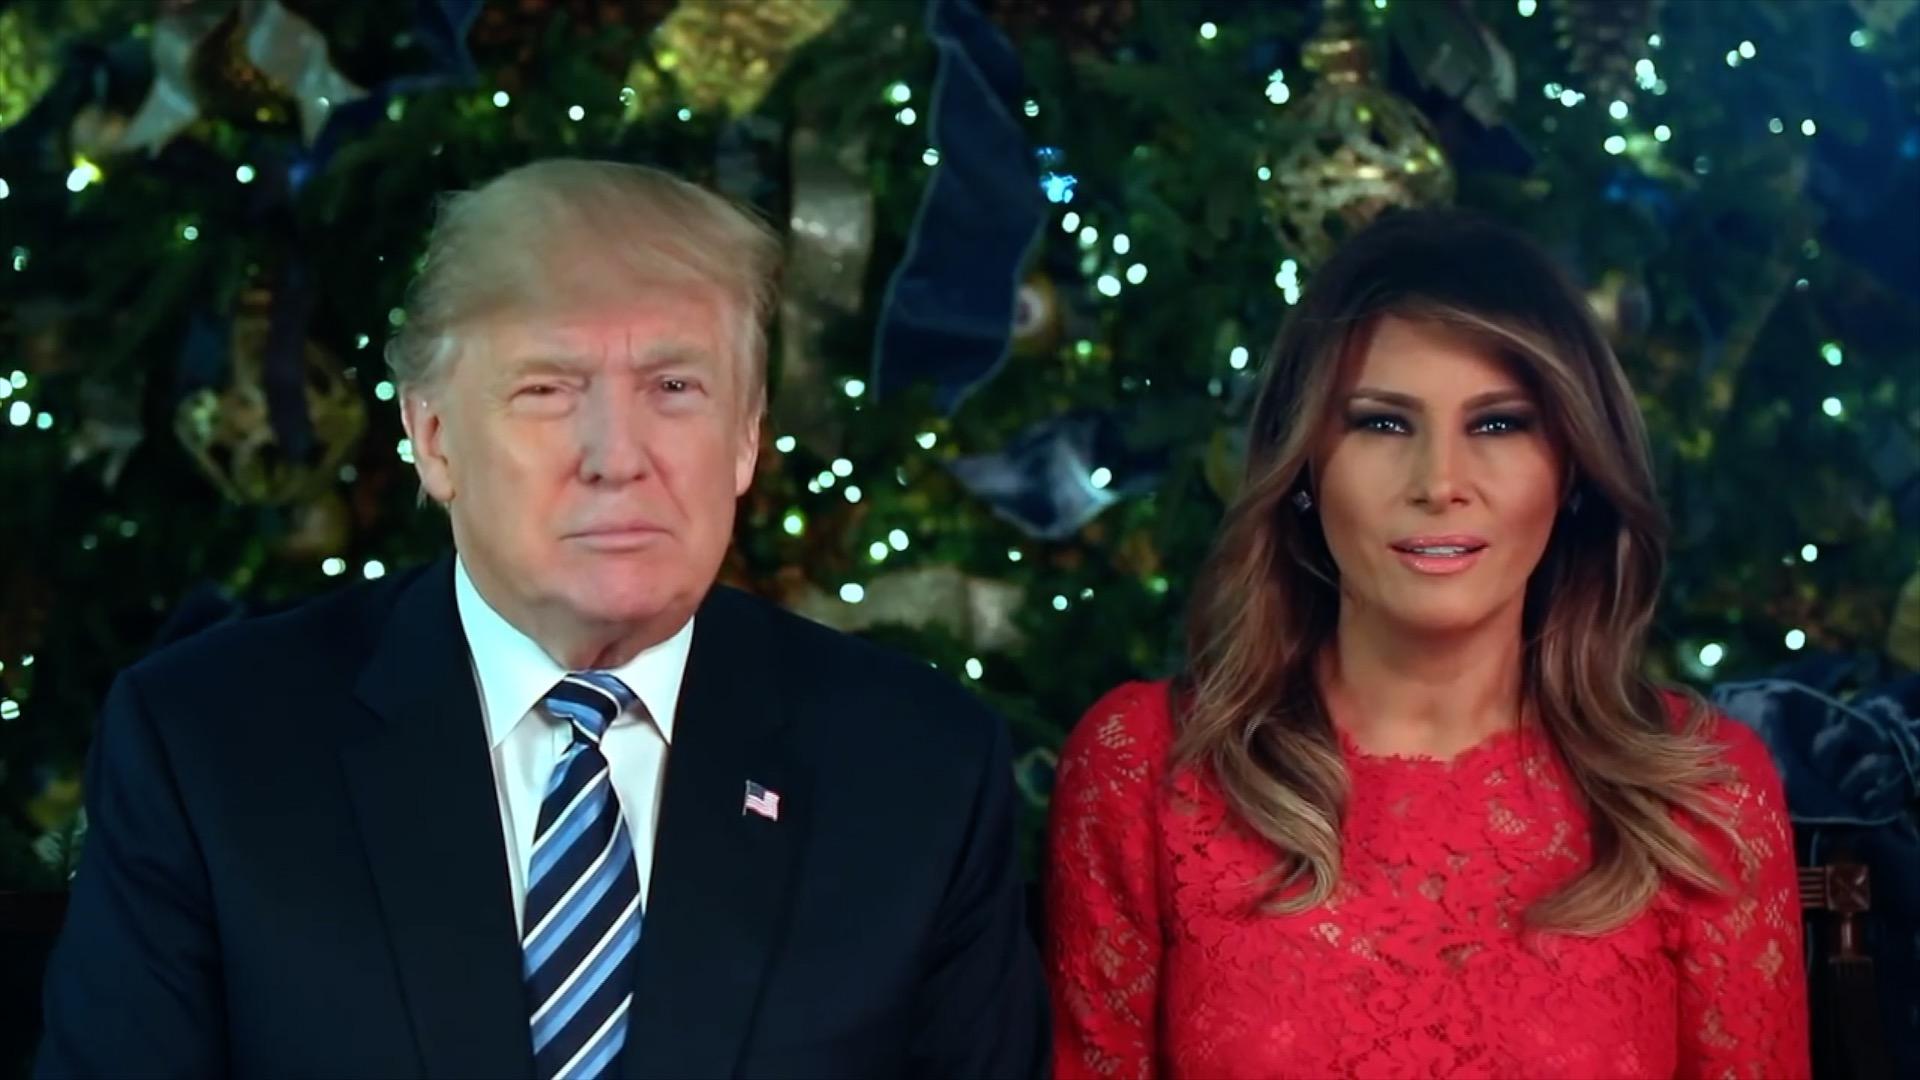 President Trump And First Lady Melania Trump Send Christmas